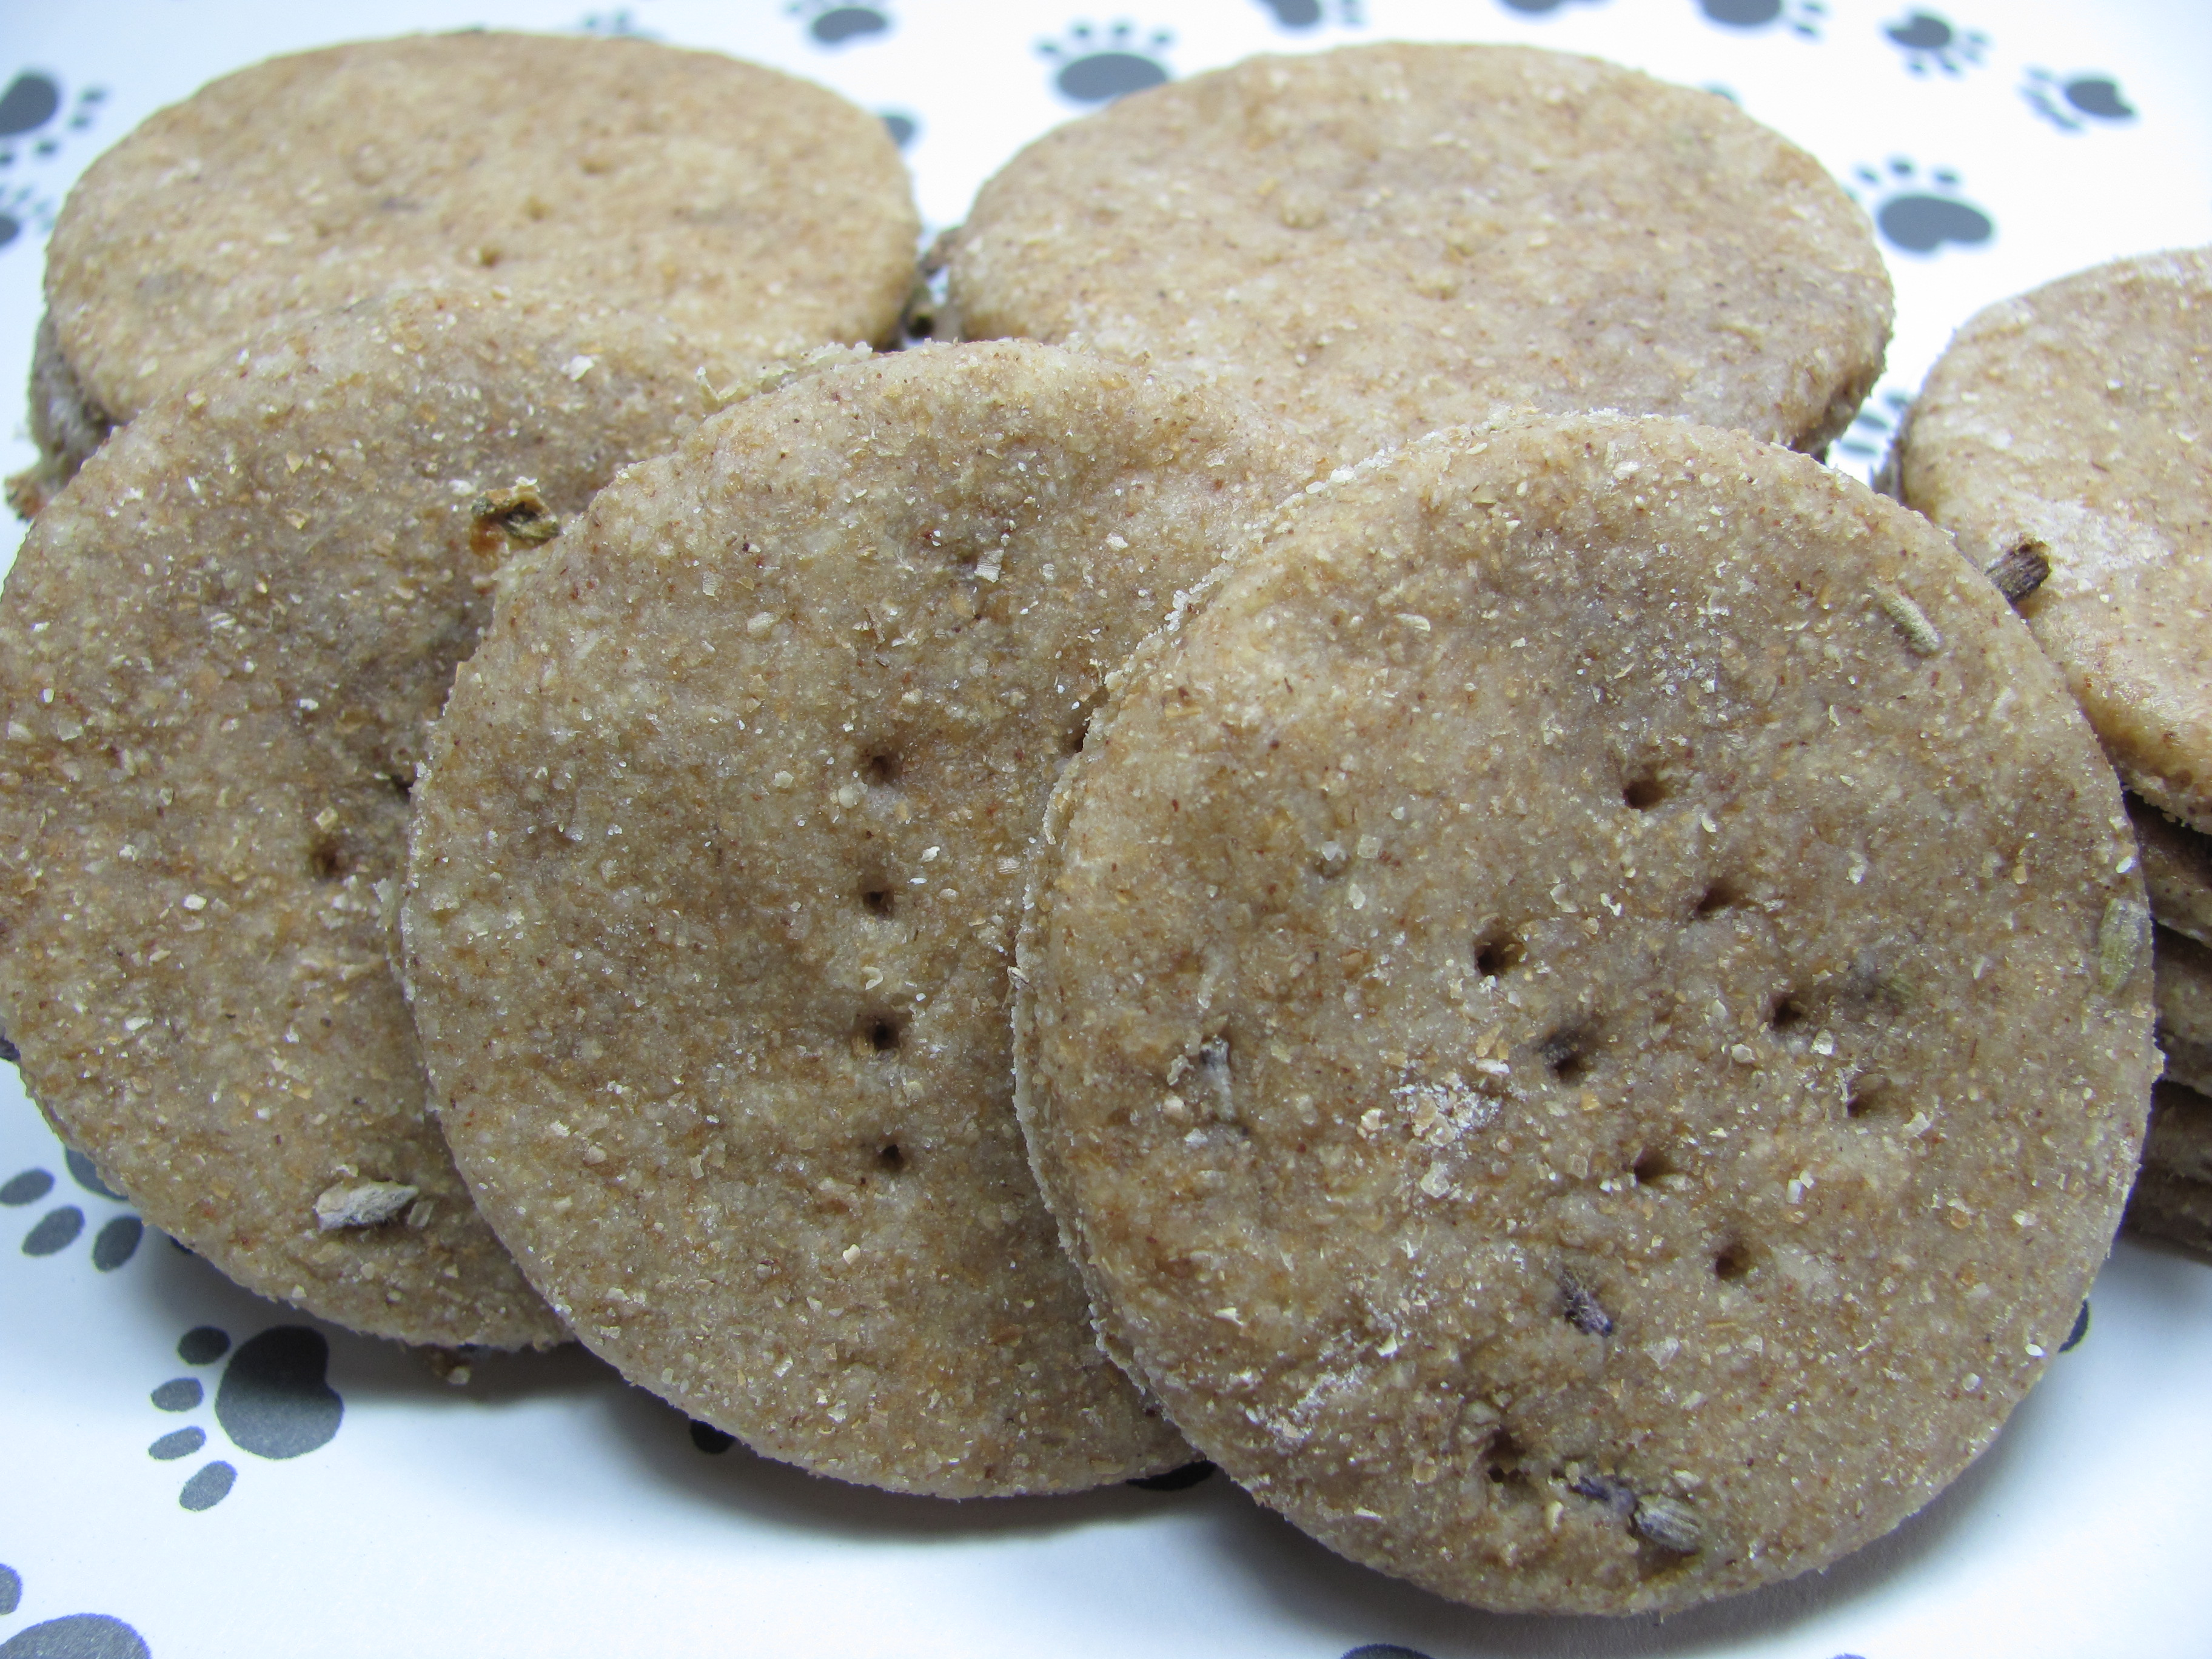 lavender honey dog treat/biscuit recipe